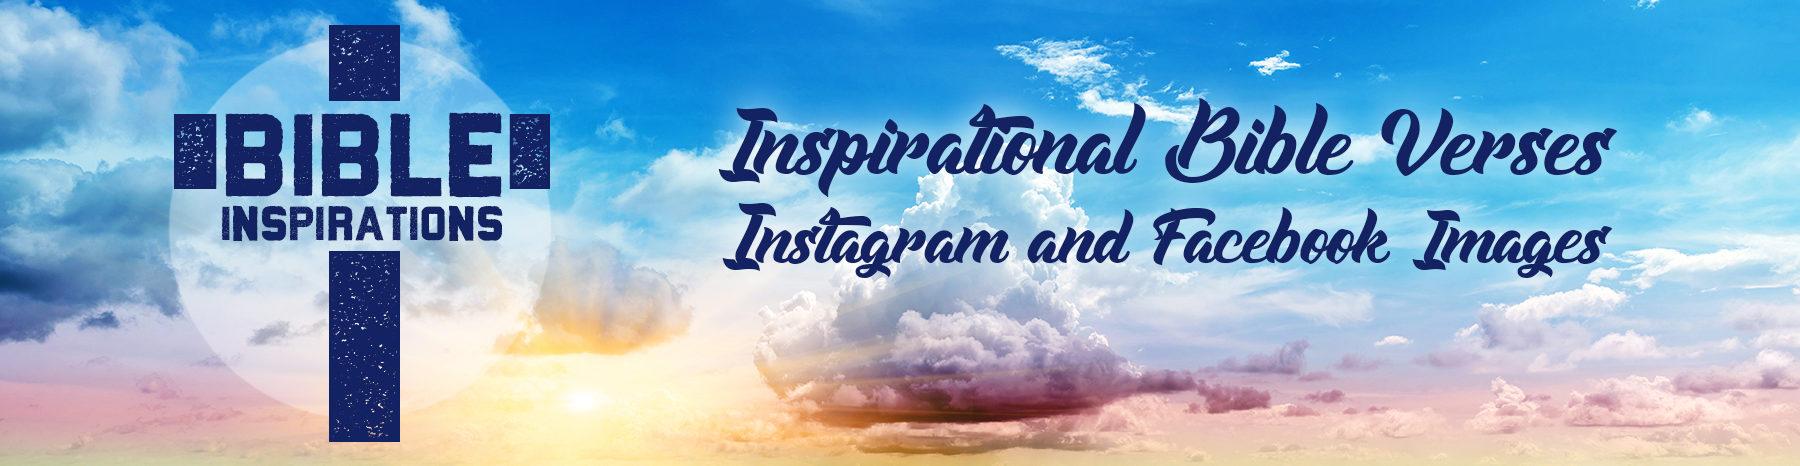 Love Understanding Quotes Wallpaper Facebook Cover Photos Bible Inspirations